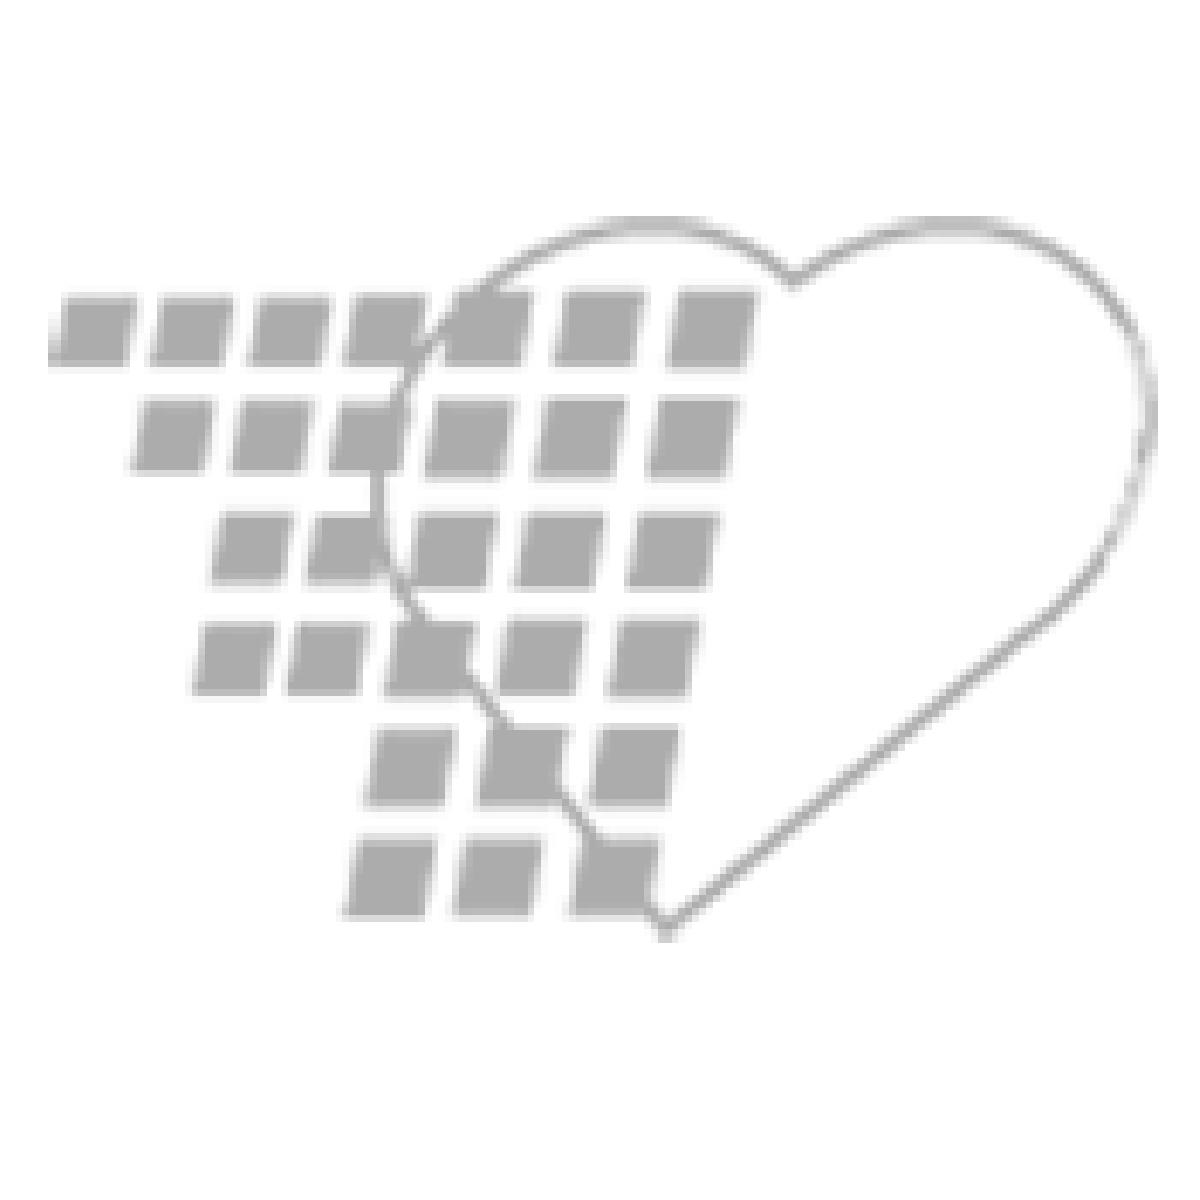 06-93-1102 - Demo Dose® Atropin Simulated Code Drug